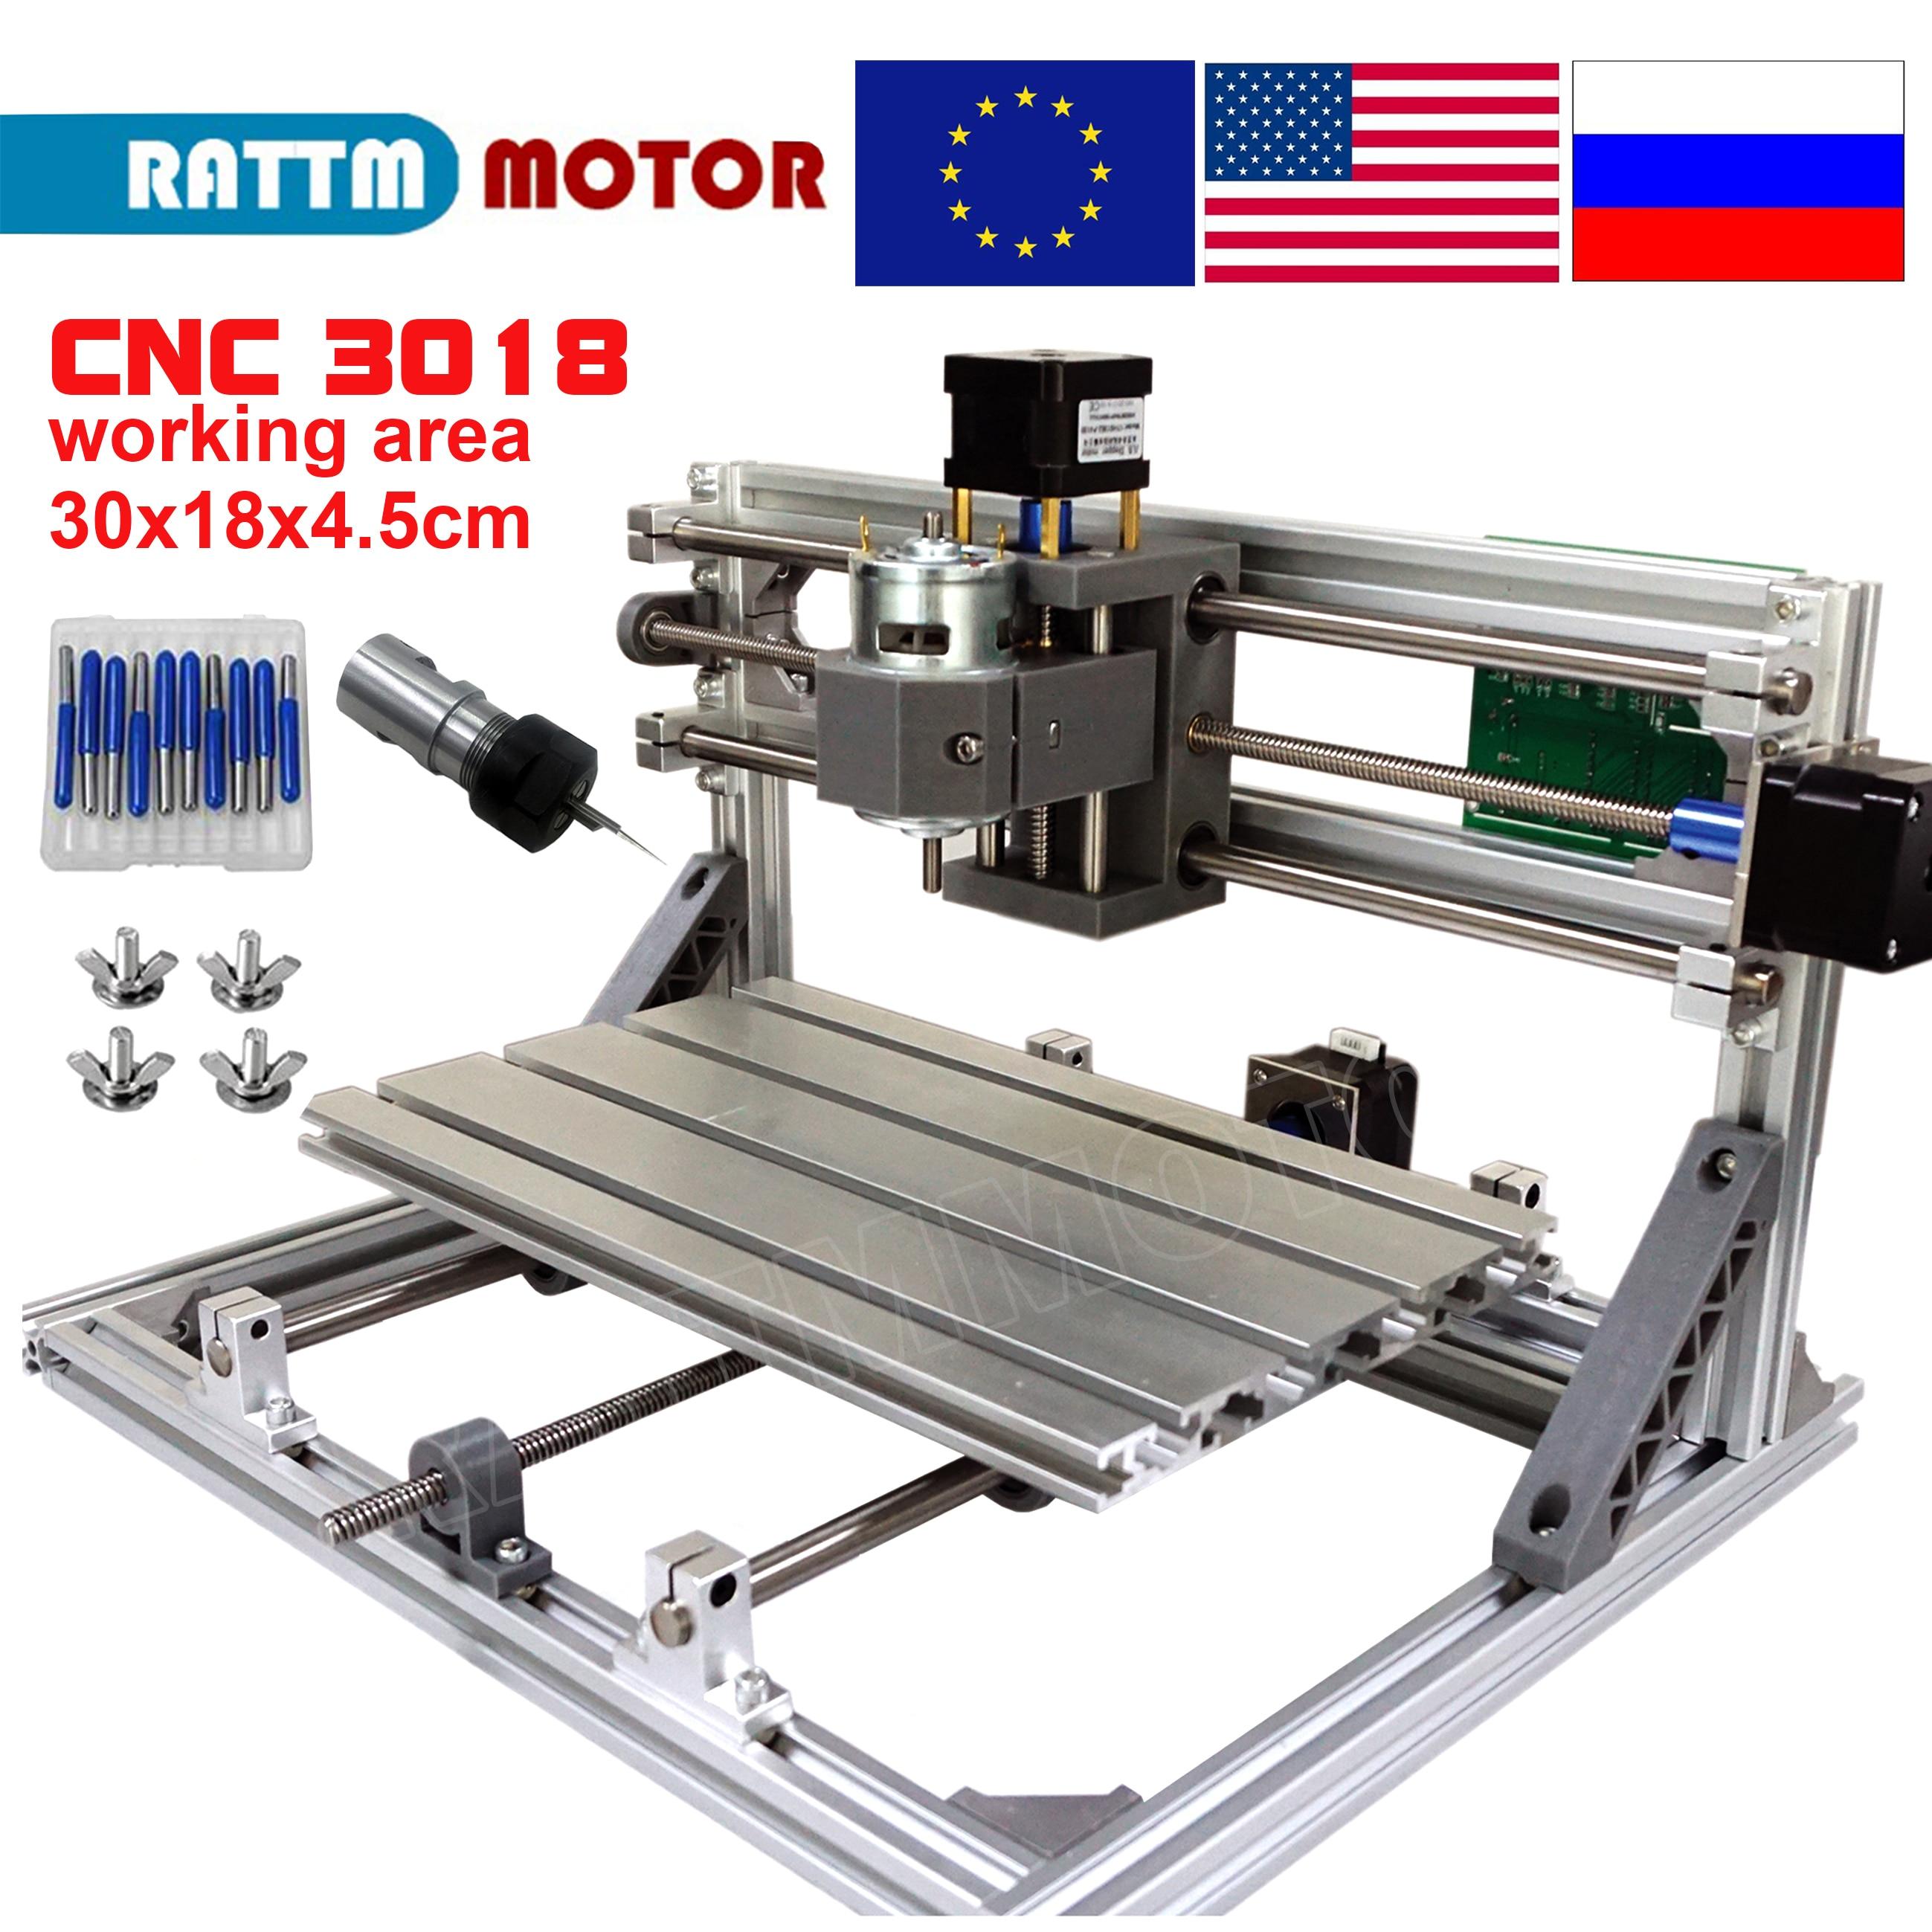 EU Ship!! CNC 3018 GRBL Control Diy CNC Machine 30x18x4.5cm,3 Axis Pcb Pvc Milling Machine Wood Router Laser Engraving V2.5